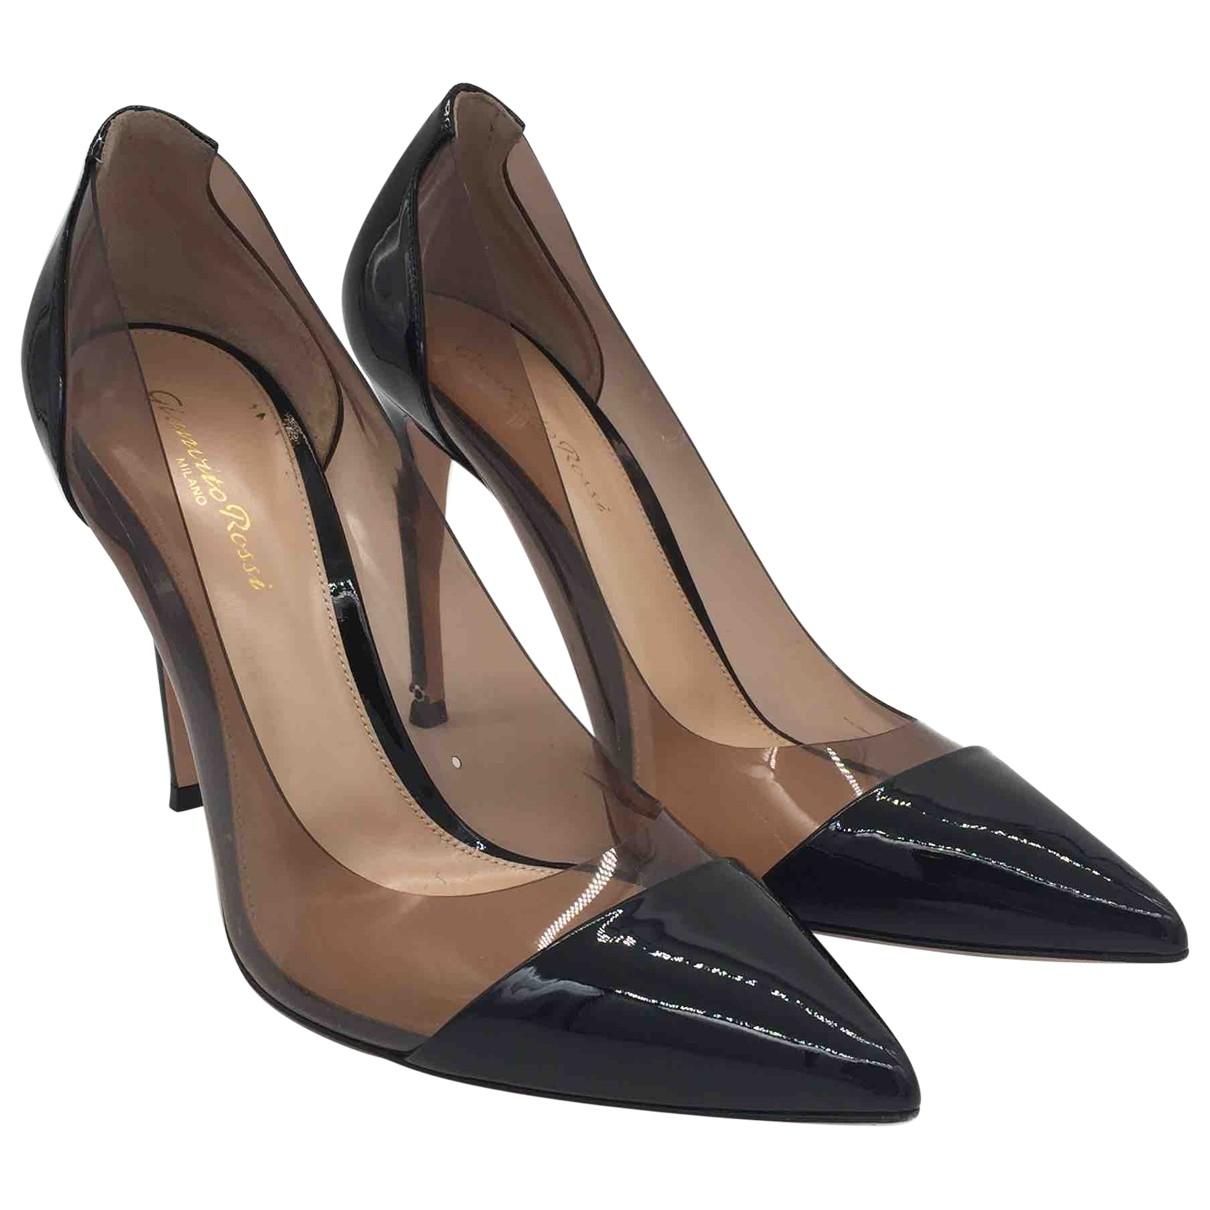 Gianvito Rossi Plexi Black Heels for Women 38.5 EU